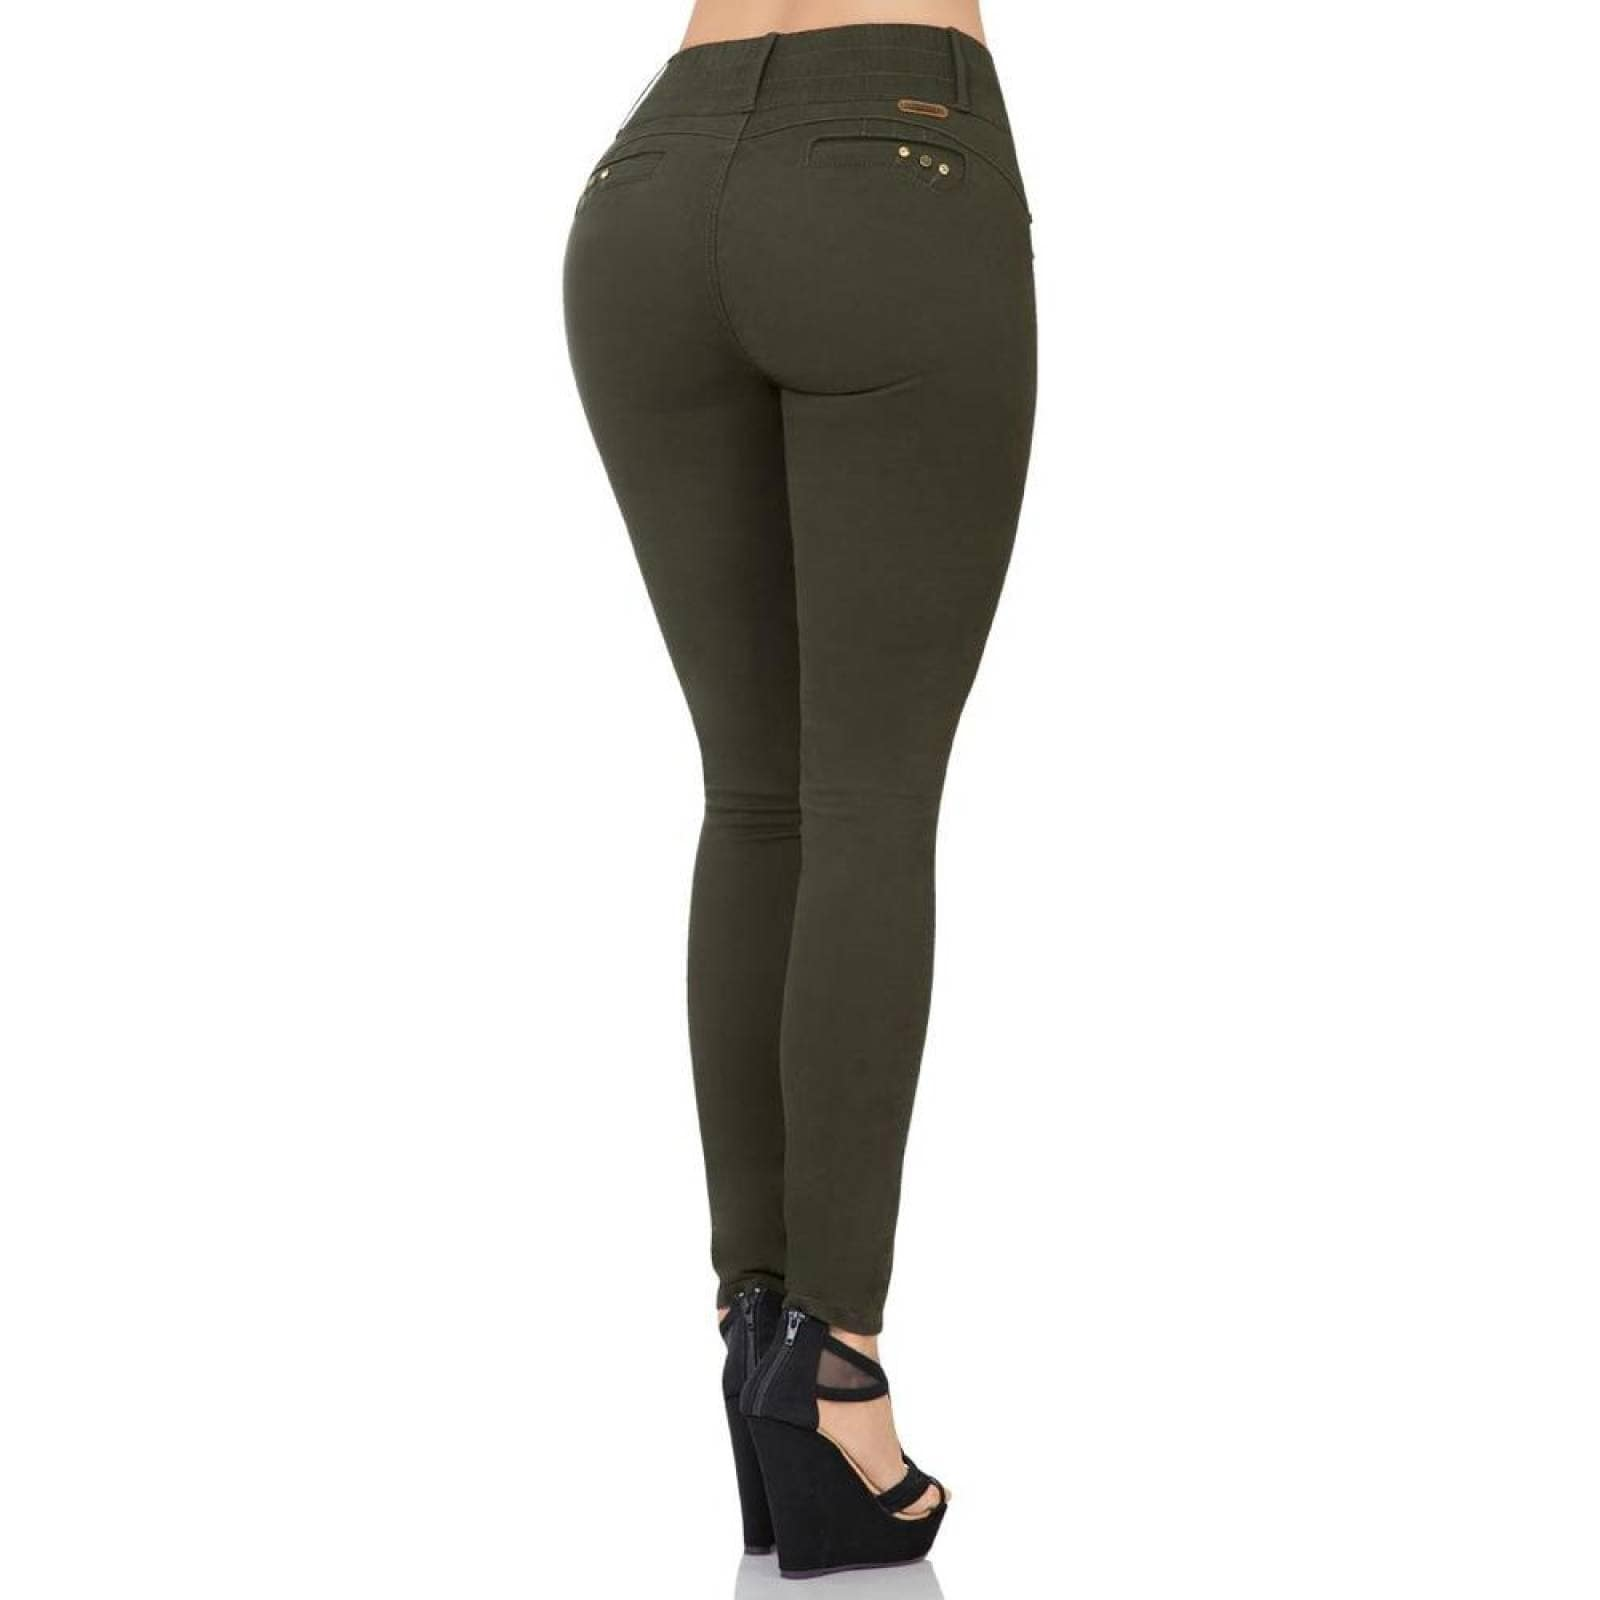 Pantalon Fergino Jeans Mujer Verde GabardinaStretch 284Salv